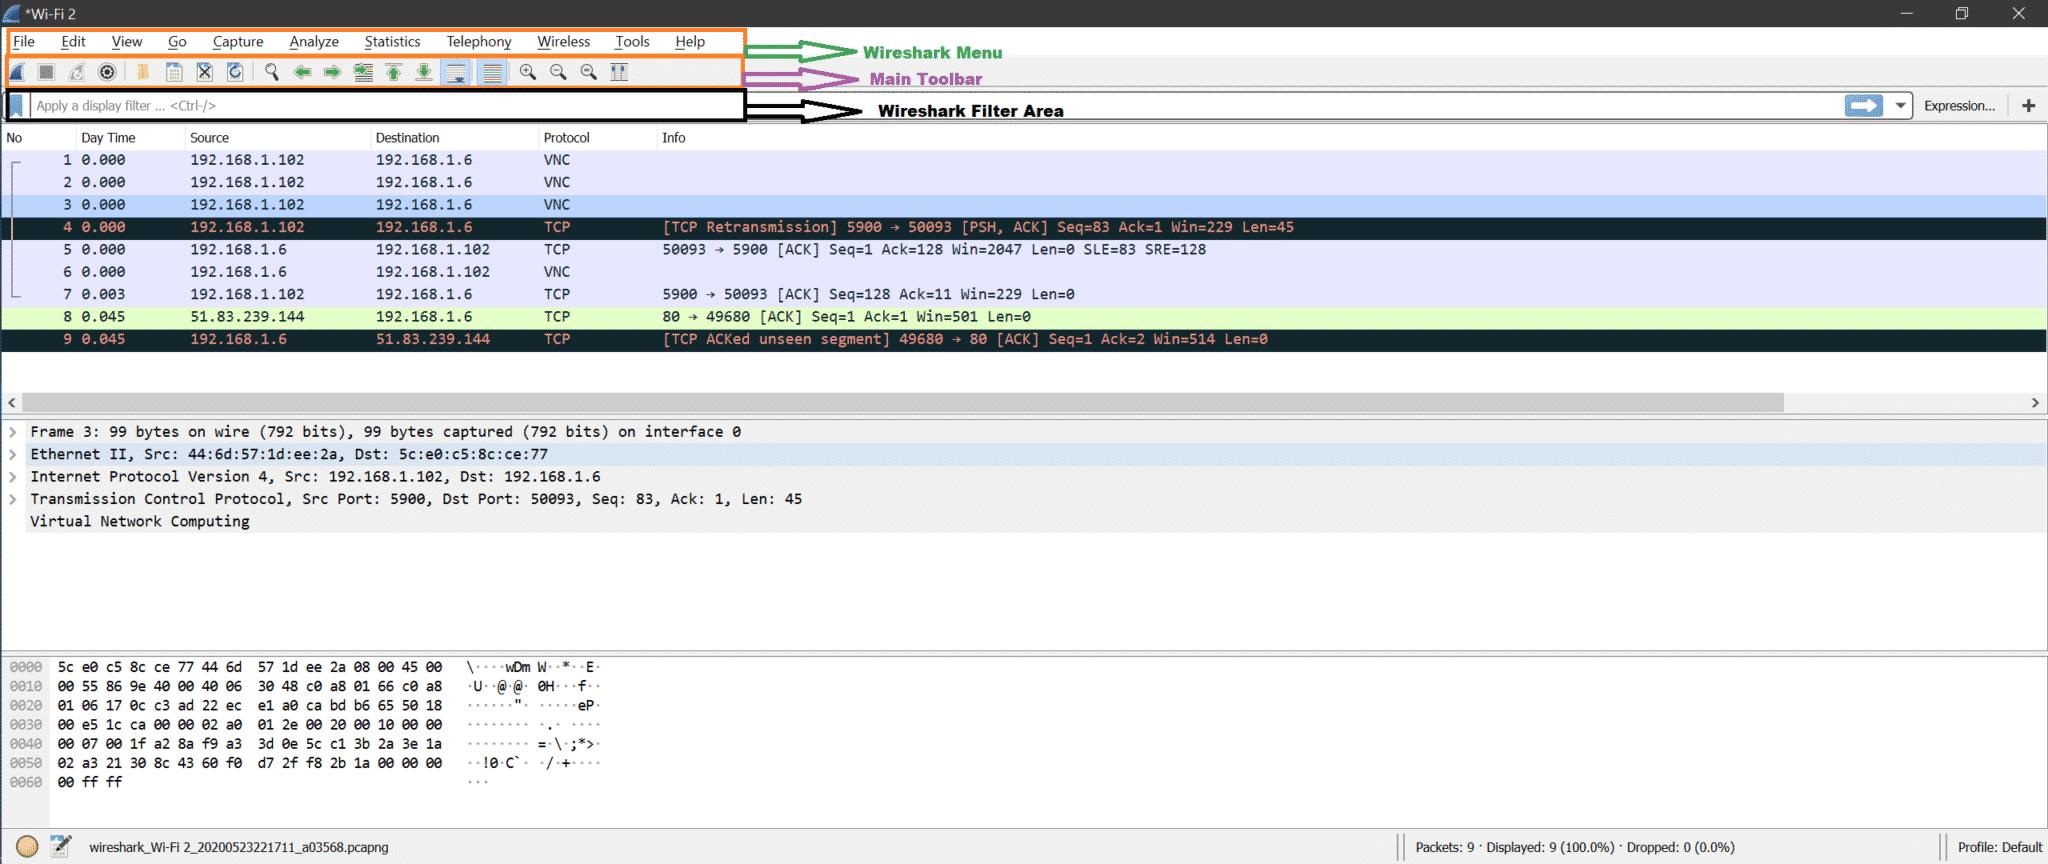 E:fiverrWorkmail74838BOOK - Linux Forensics Tools & Techniquespic2.png